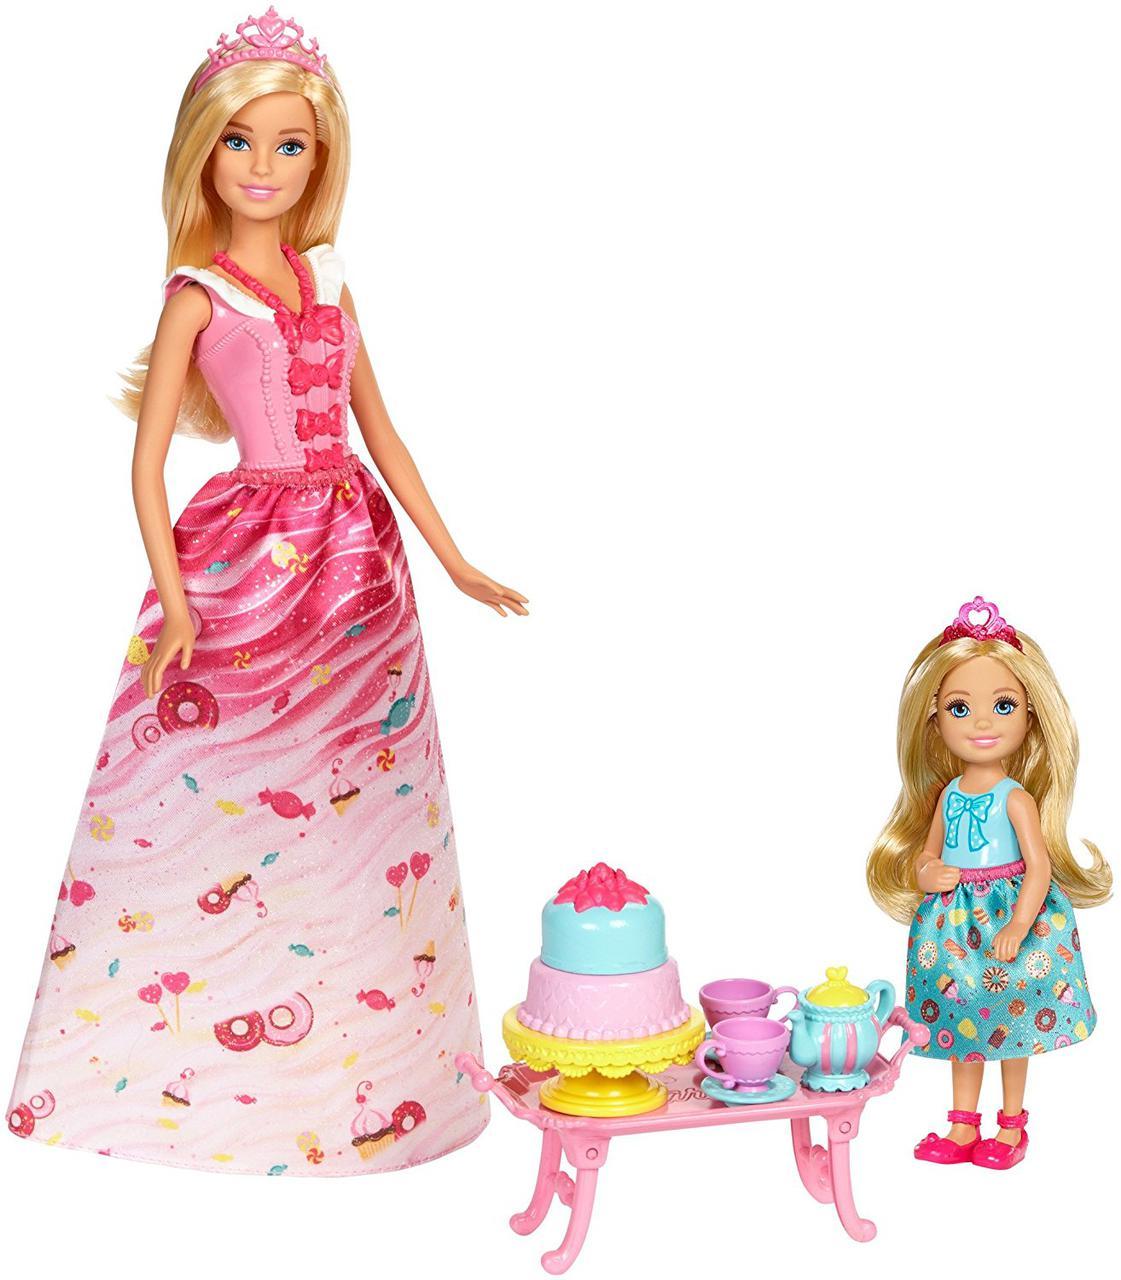 Барби Сладкое Чаепитие в Свитвилле Дримтопия Barbie Dreamtopia Sweetville Kingdom Princess Tea Party